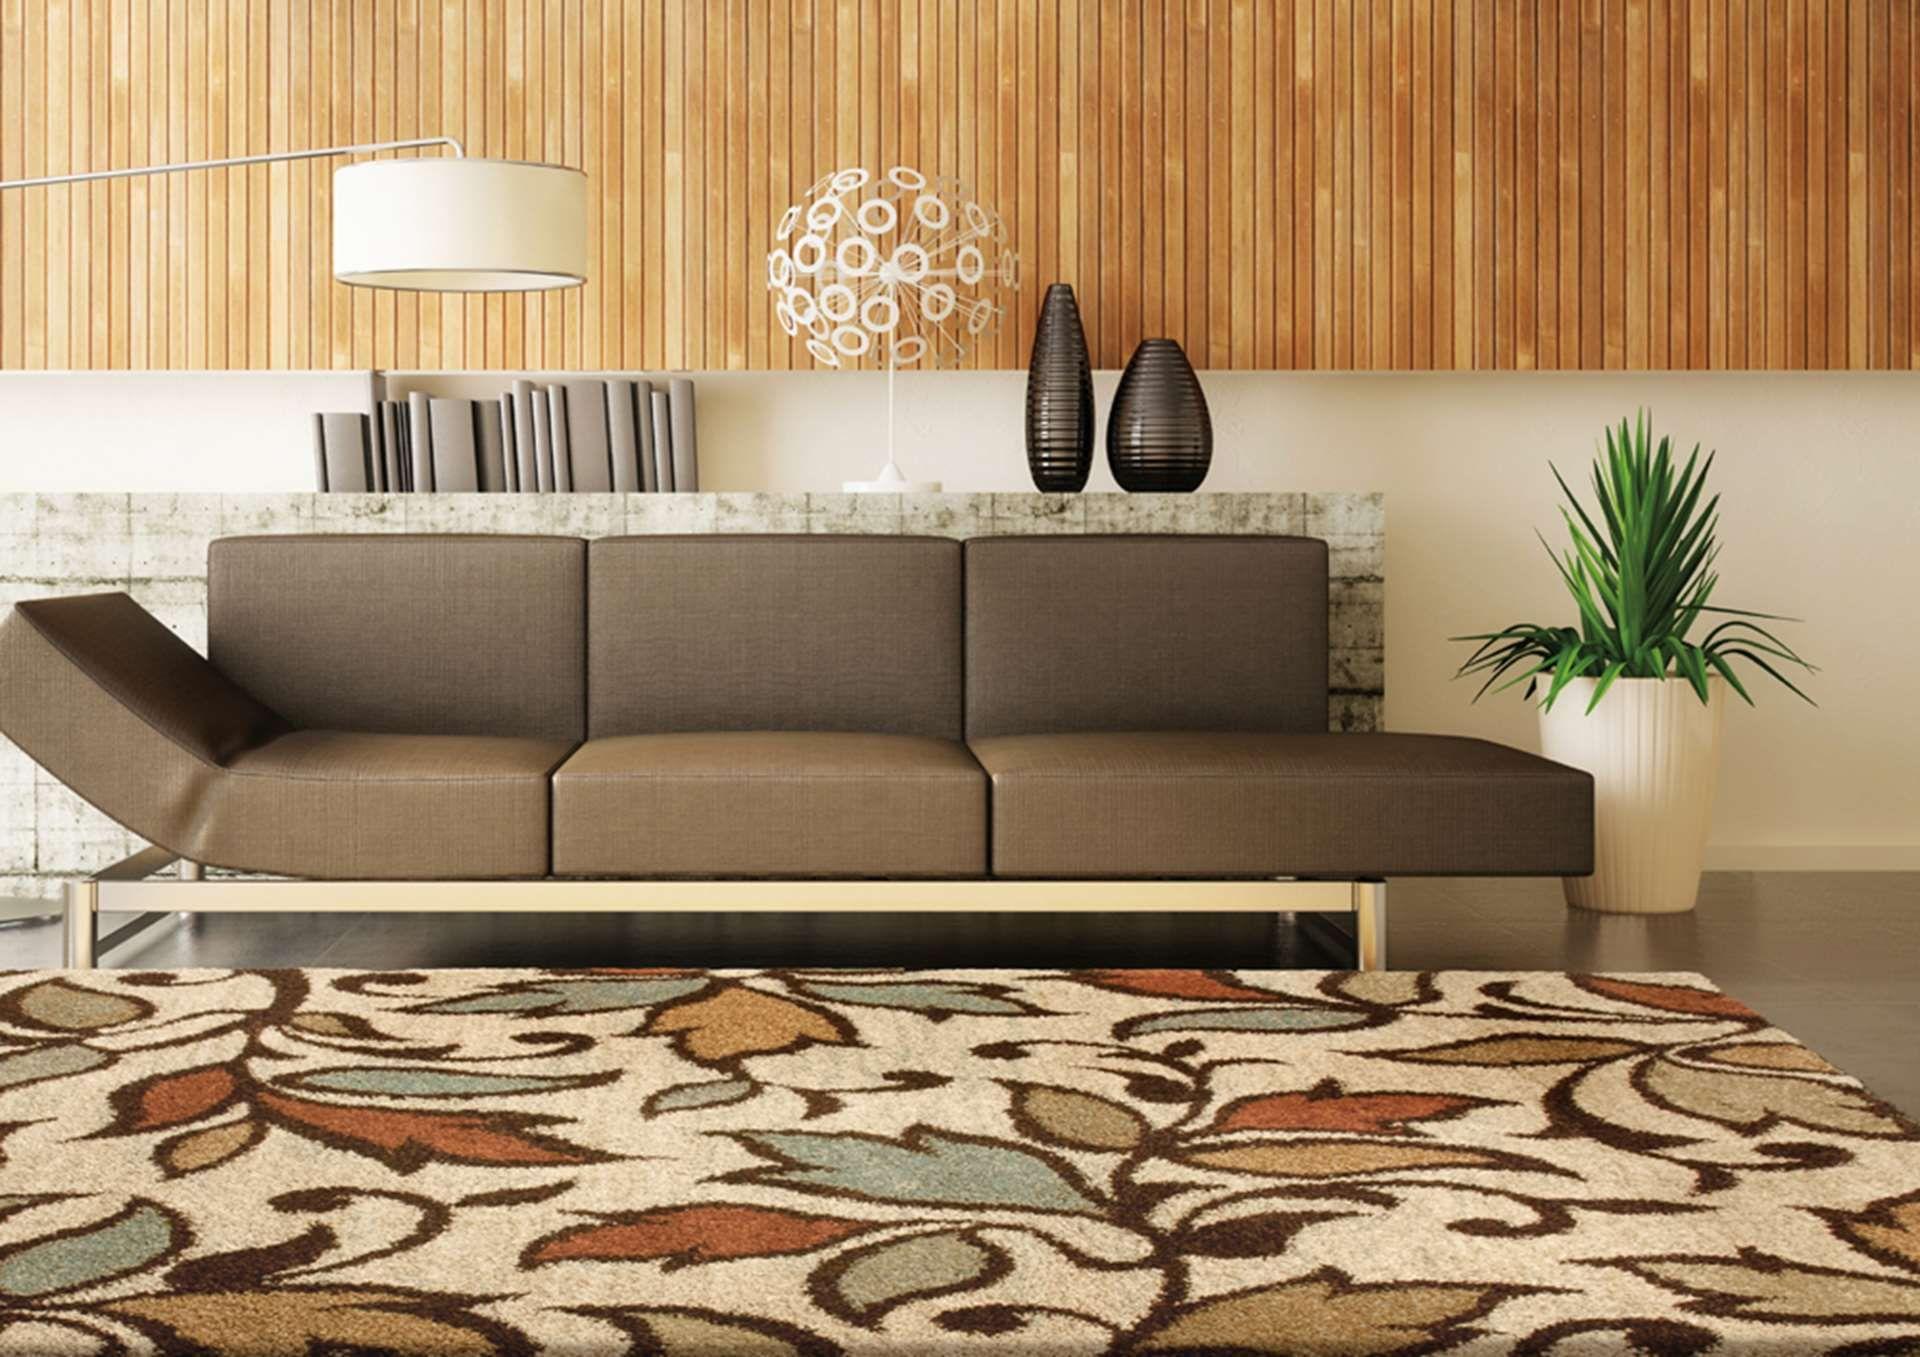 Living Room Rug With Captivating Design  House Interior Design Enchanting Carpet Designs For Living Room Review